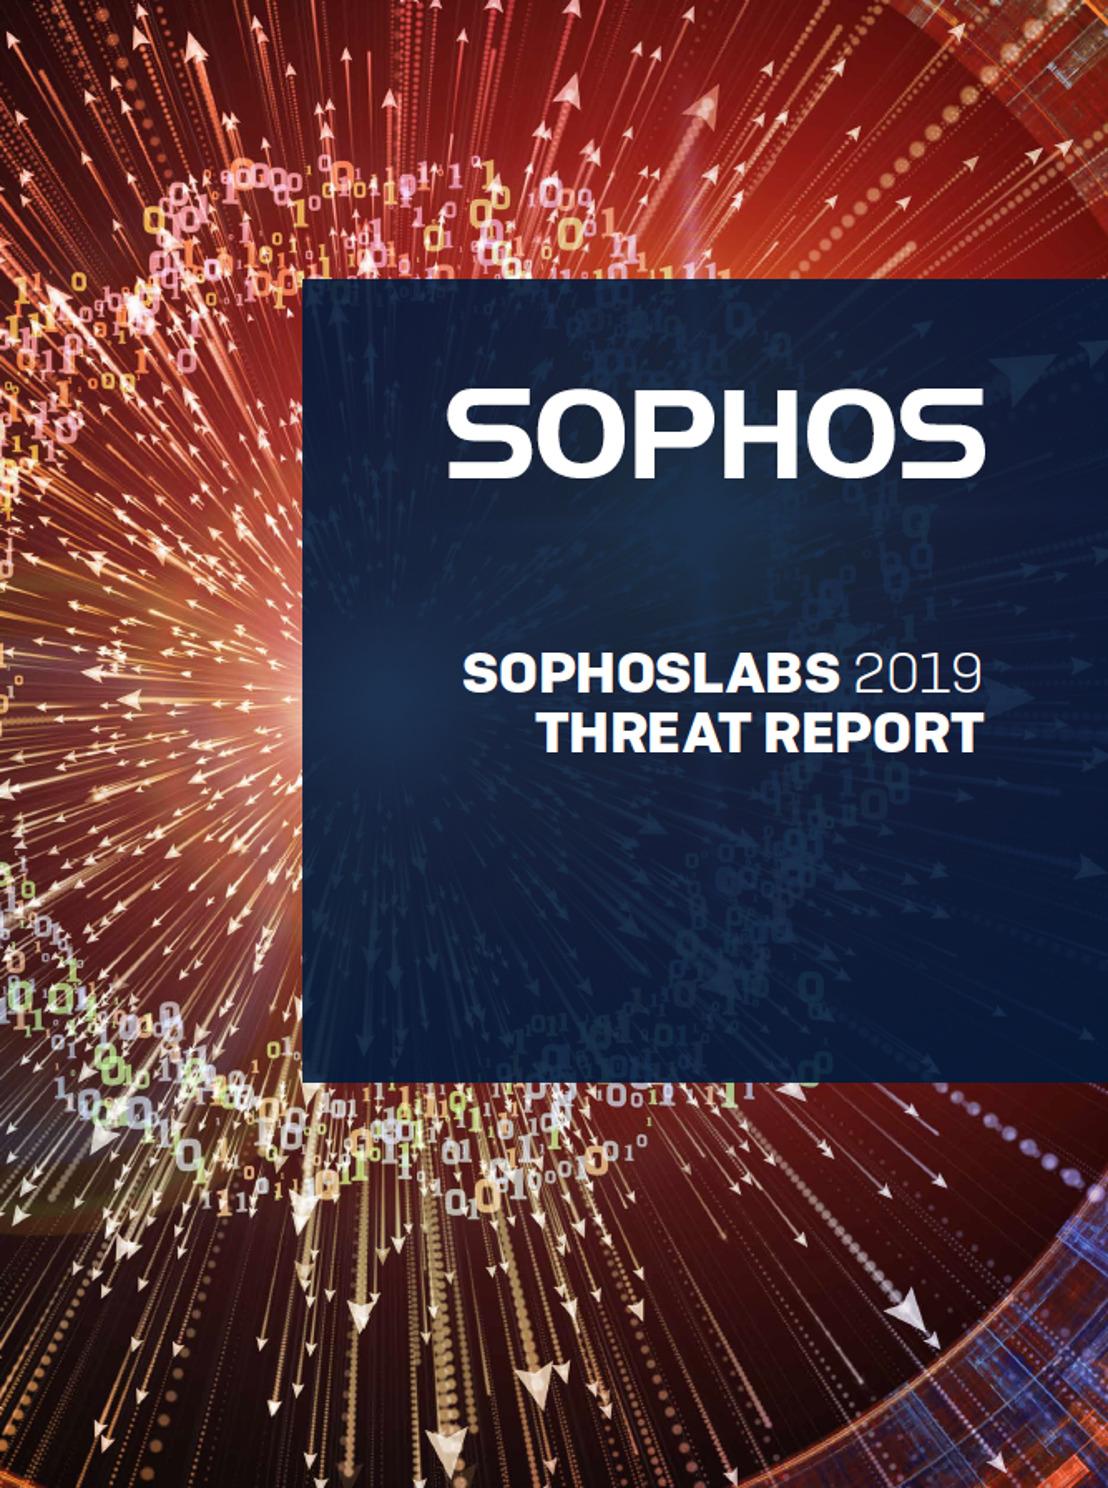 Sophos 2019 Threat Report